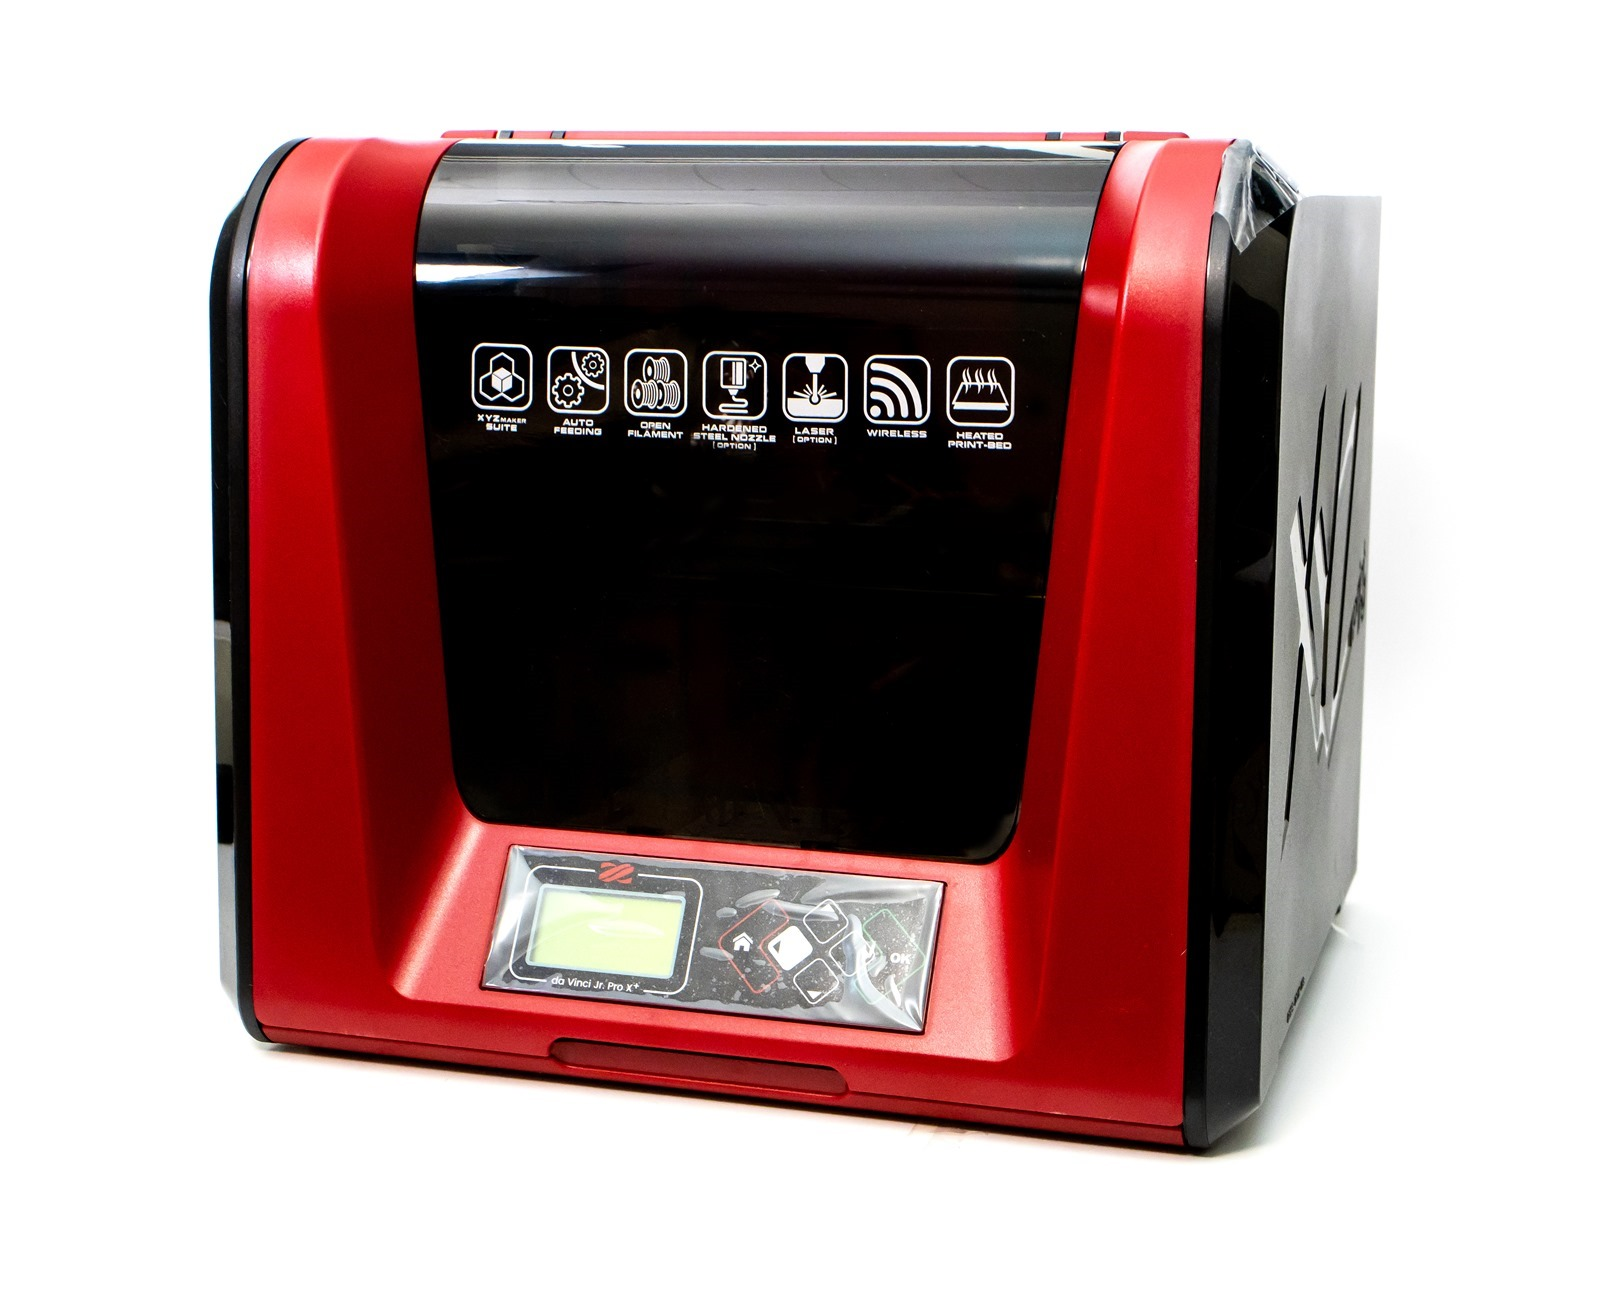 XYZprinring多功能3D列印機-da Vinci Jr. Pro X+3D列印機開箱,使用不同材質的第三方列印線材也沒問題,還有加熱式平台讓列印效果更棒了! 標題:da Vinci Jr. Pro X+-多功能3D列印機-3D打印機-3D印表機-3D立體列印機-XYZprinting